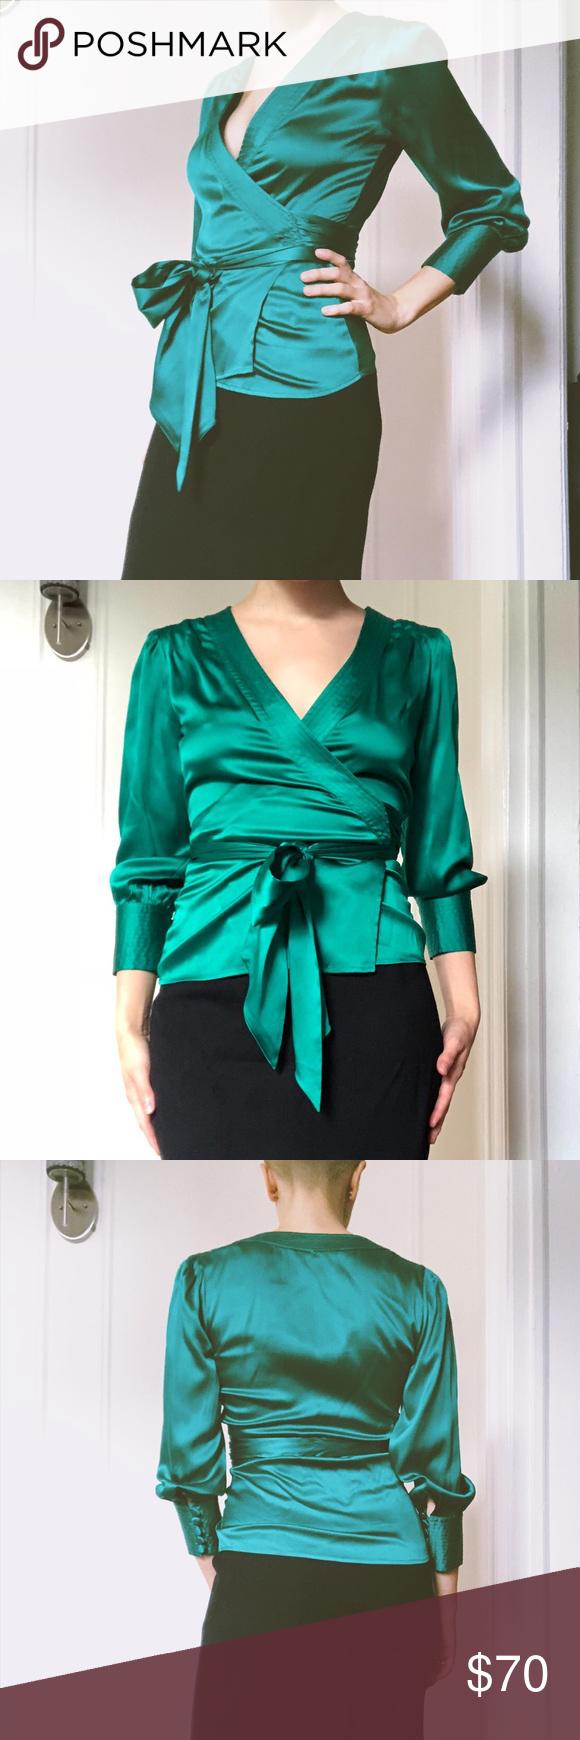 81b686992914 Diane vin Furstenberg silk Ariana top green size 2 Emerald Diane von  Furstenberg silk Ariana wrap